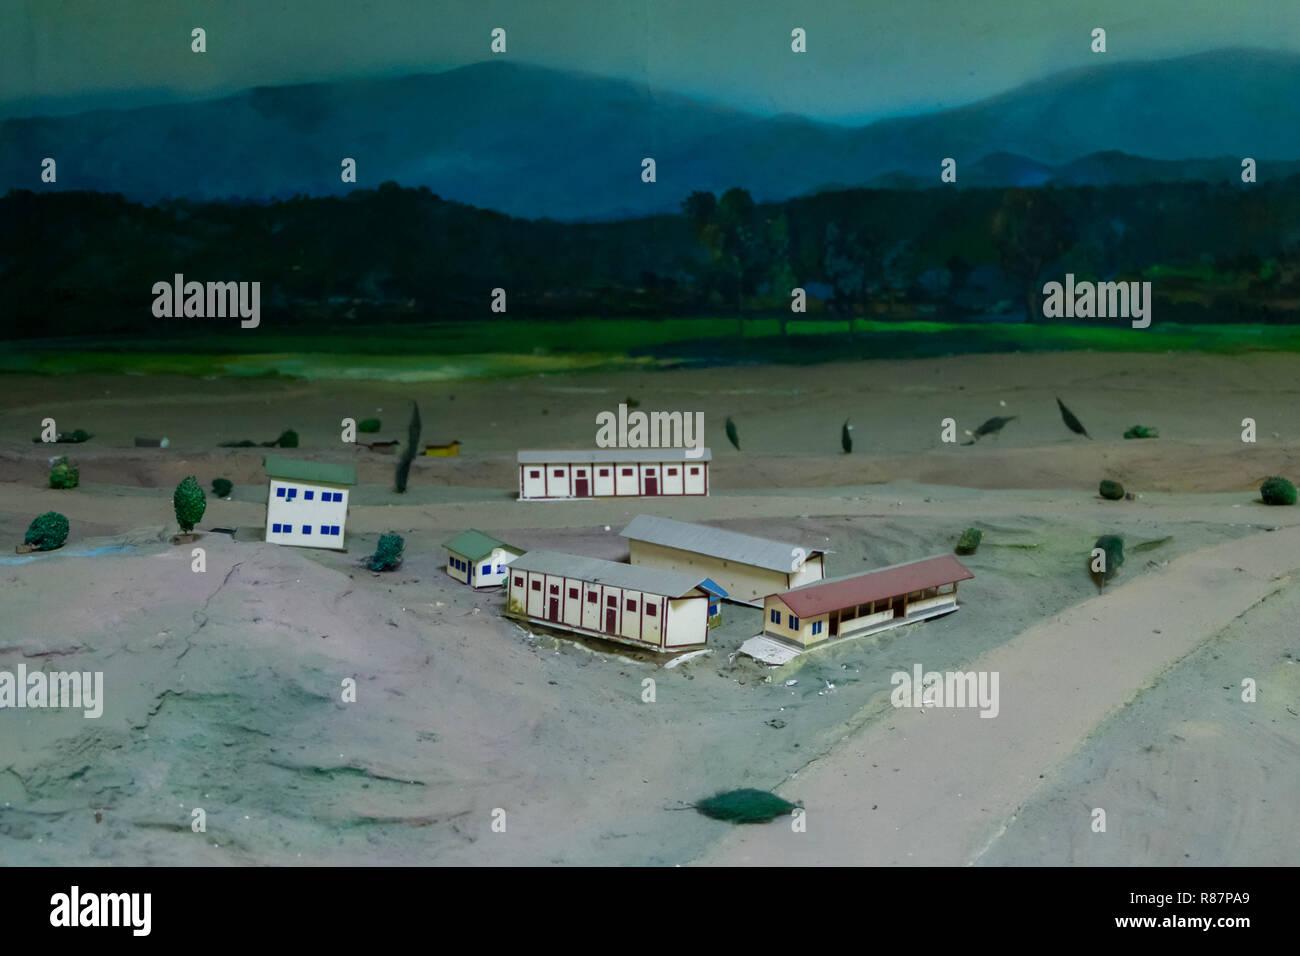 Military camp diorama at the Drug Elimination Museum in Yangon, Myanmar. Stock Photo